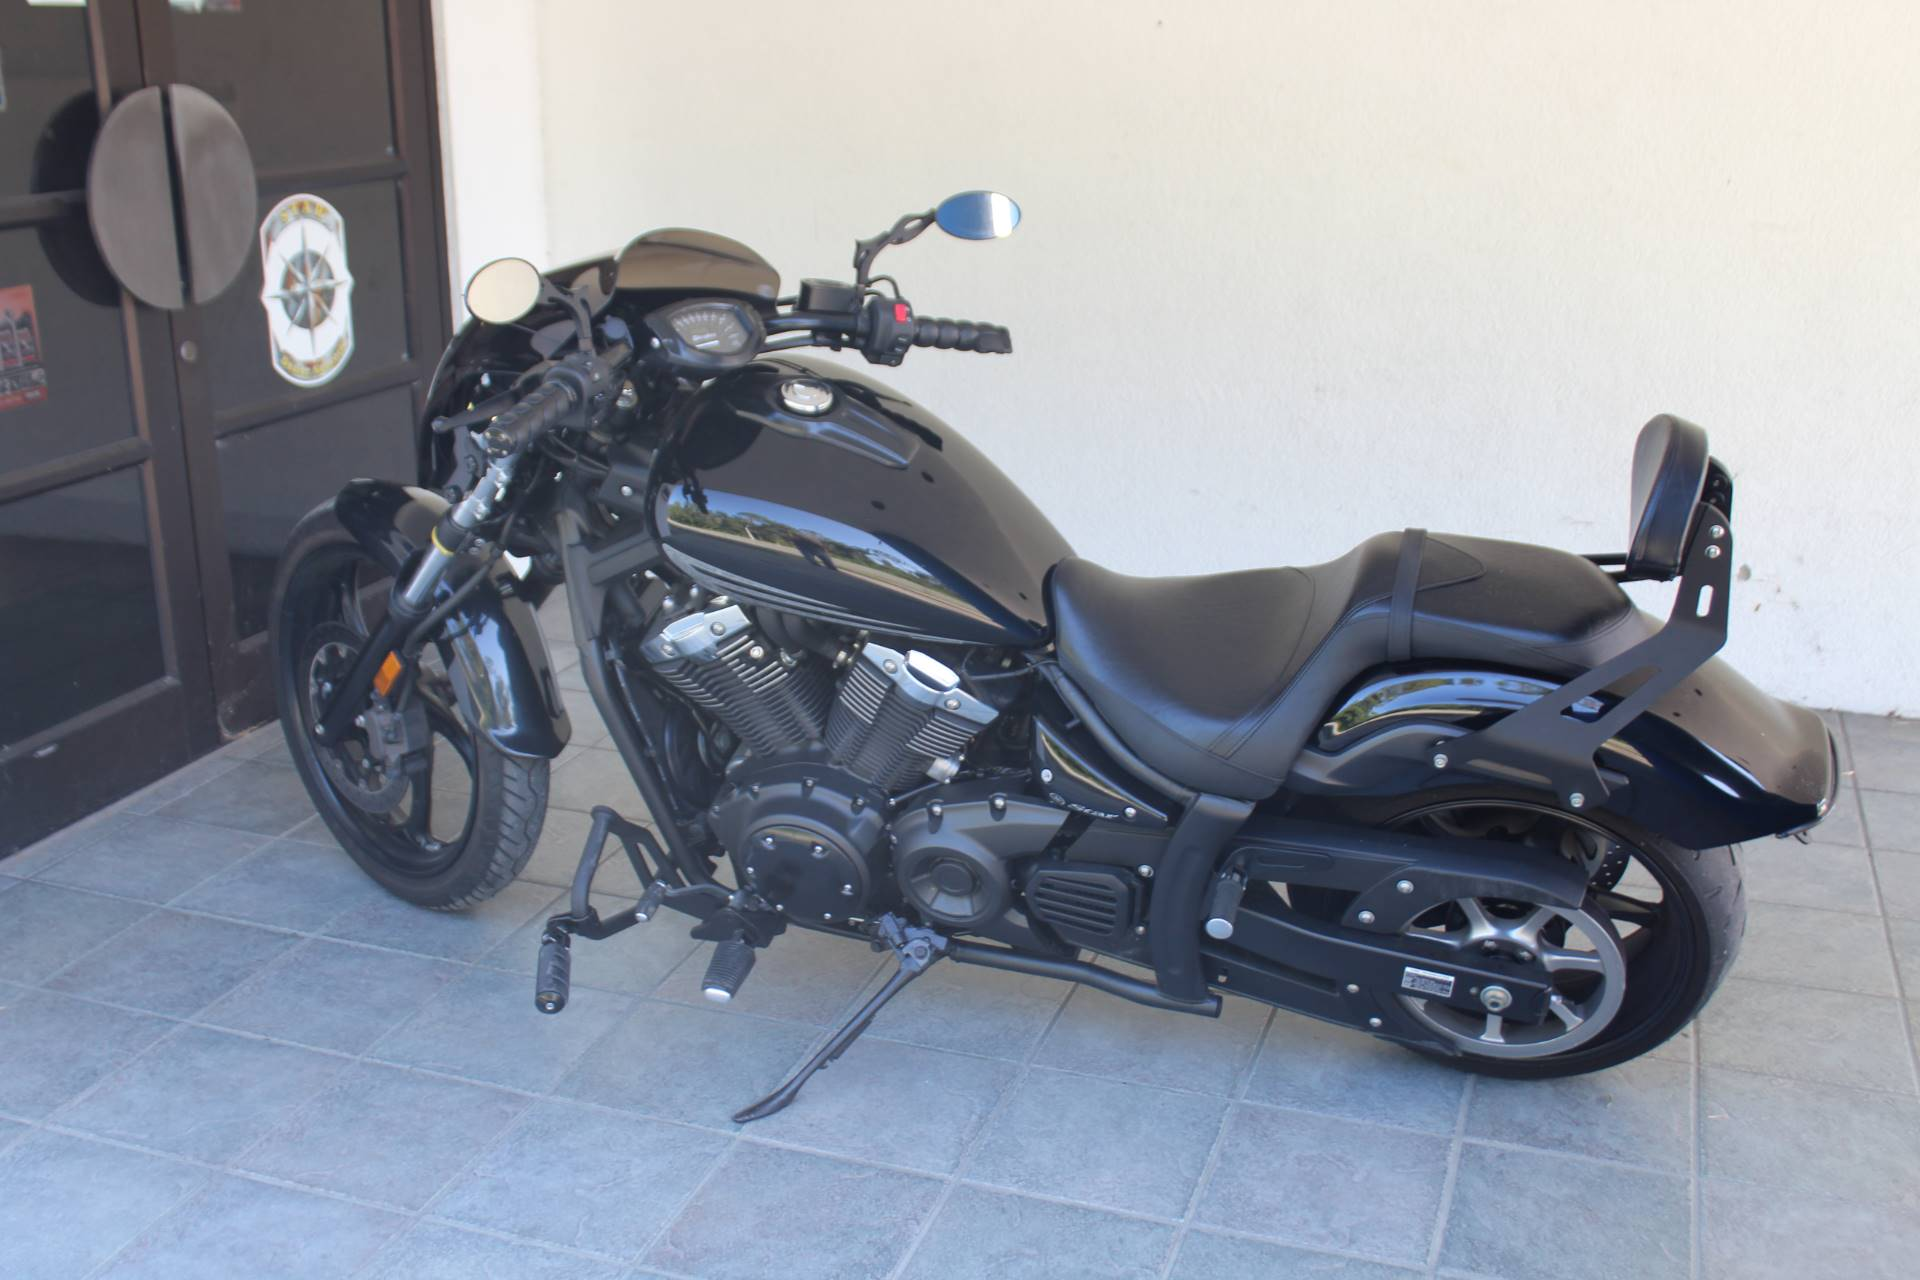 2011 Yamaha Stryker for sale 62677